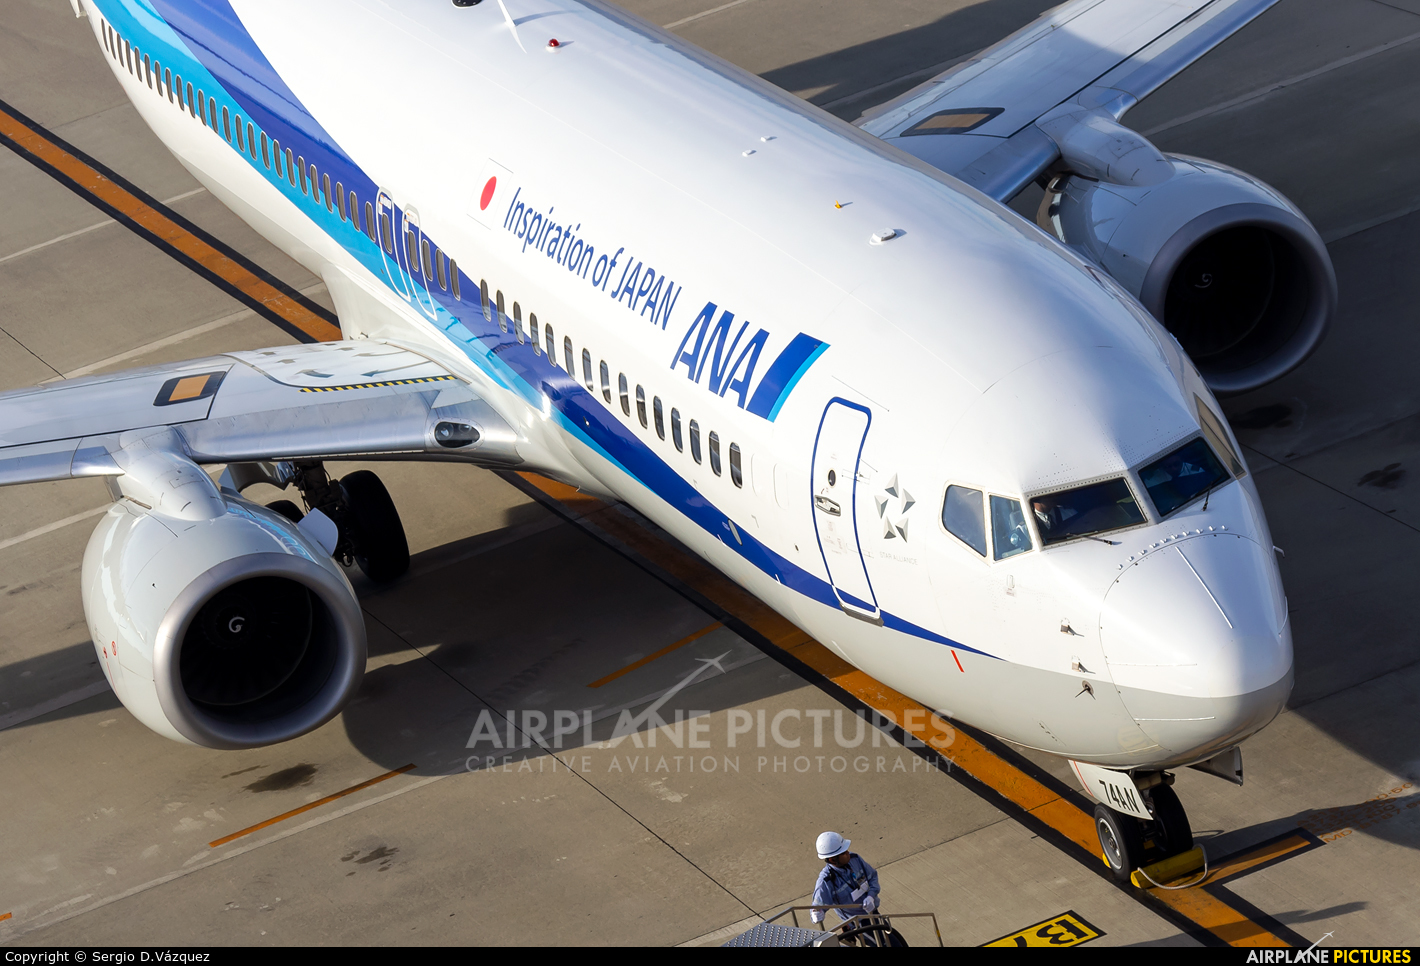 ANA - All Nippon Airways JA84AN aircraft at Chubu Centrair Intl